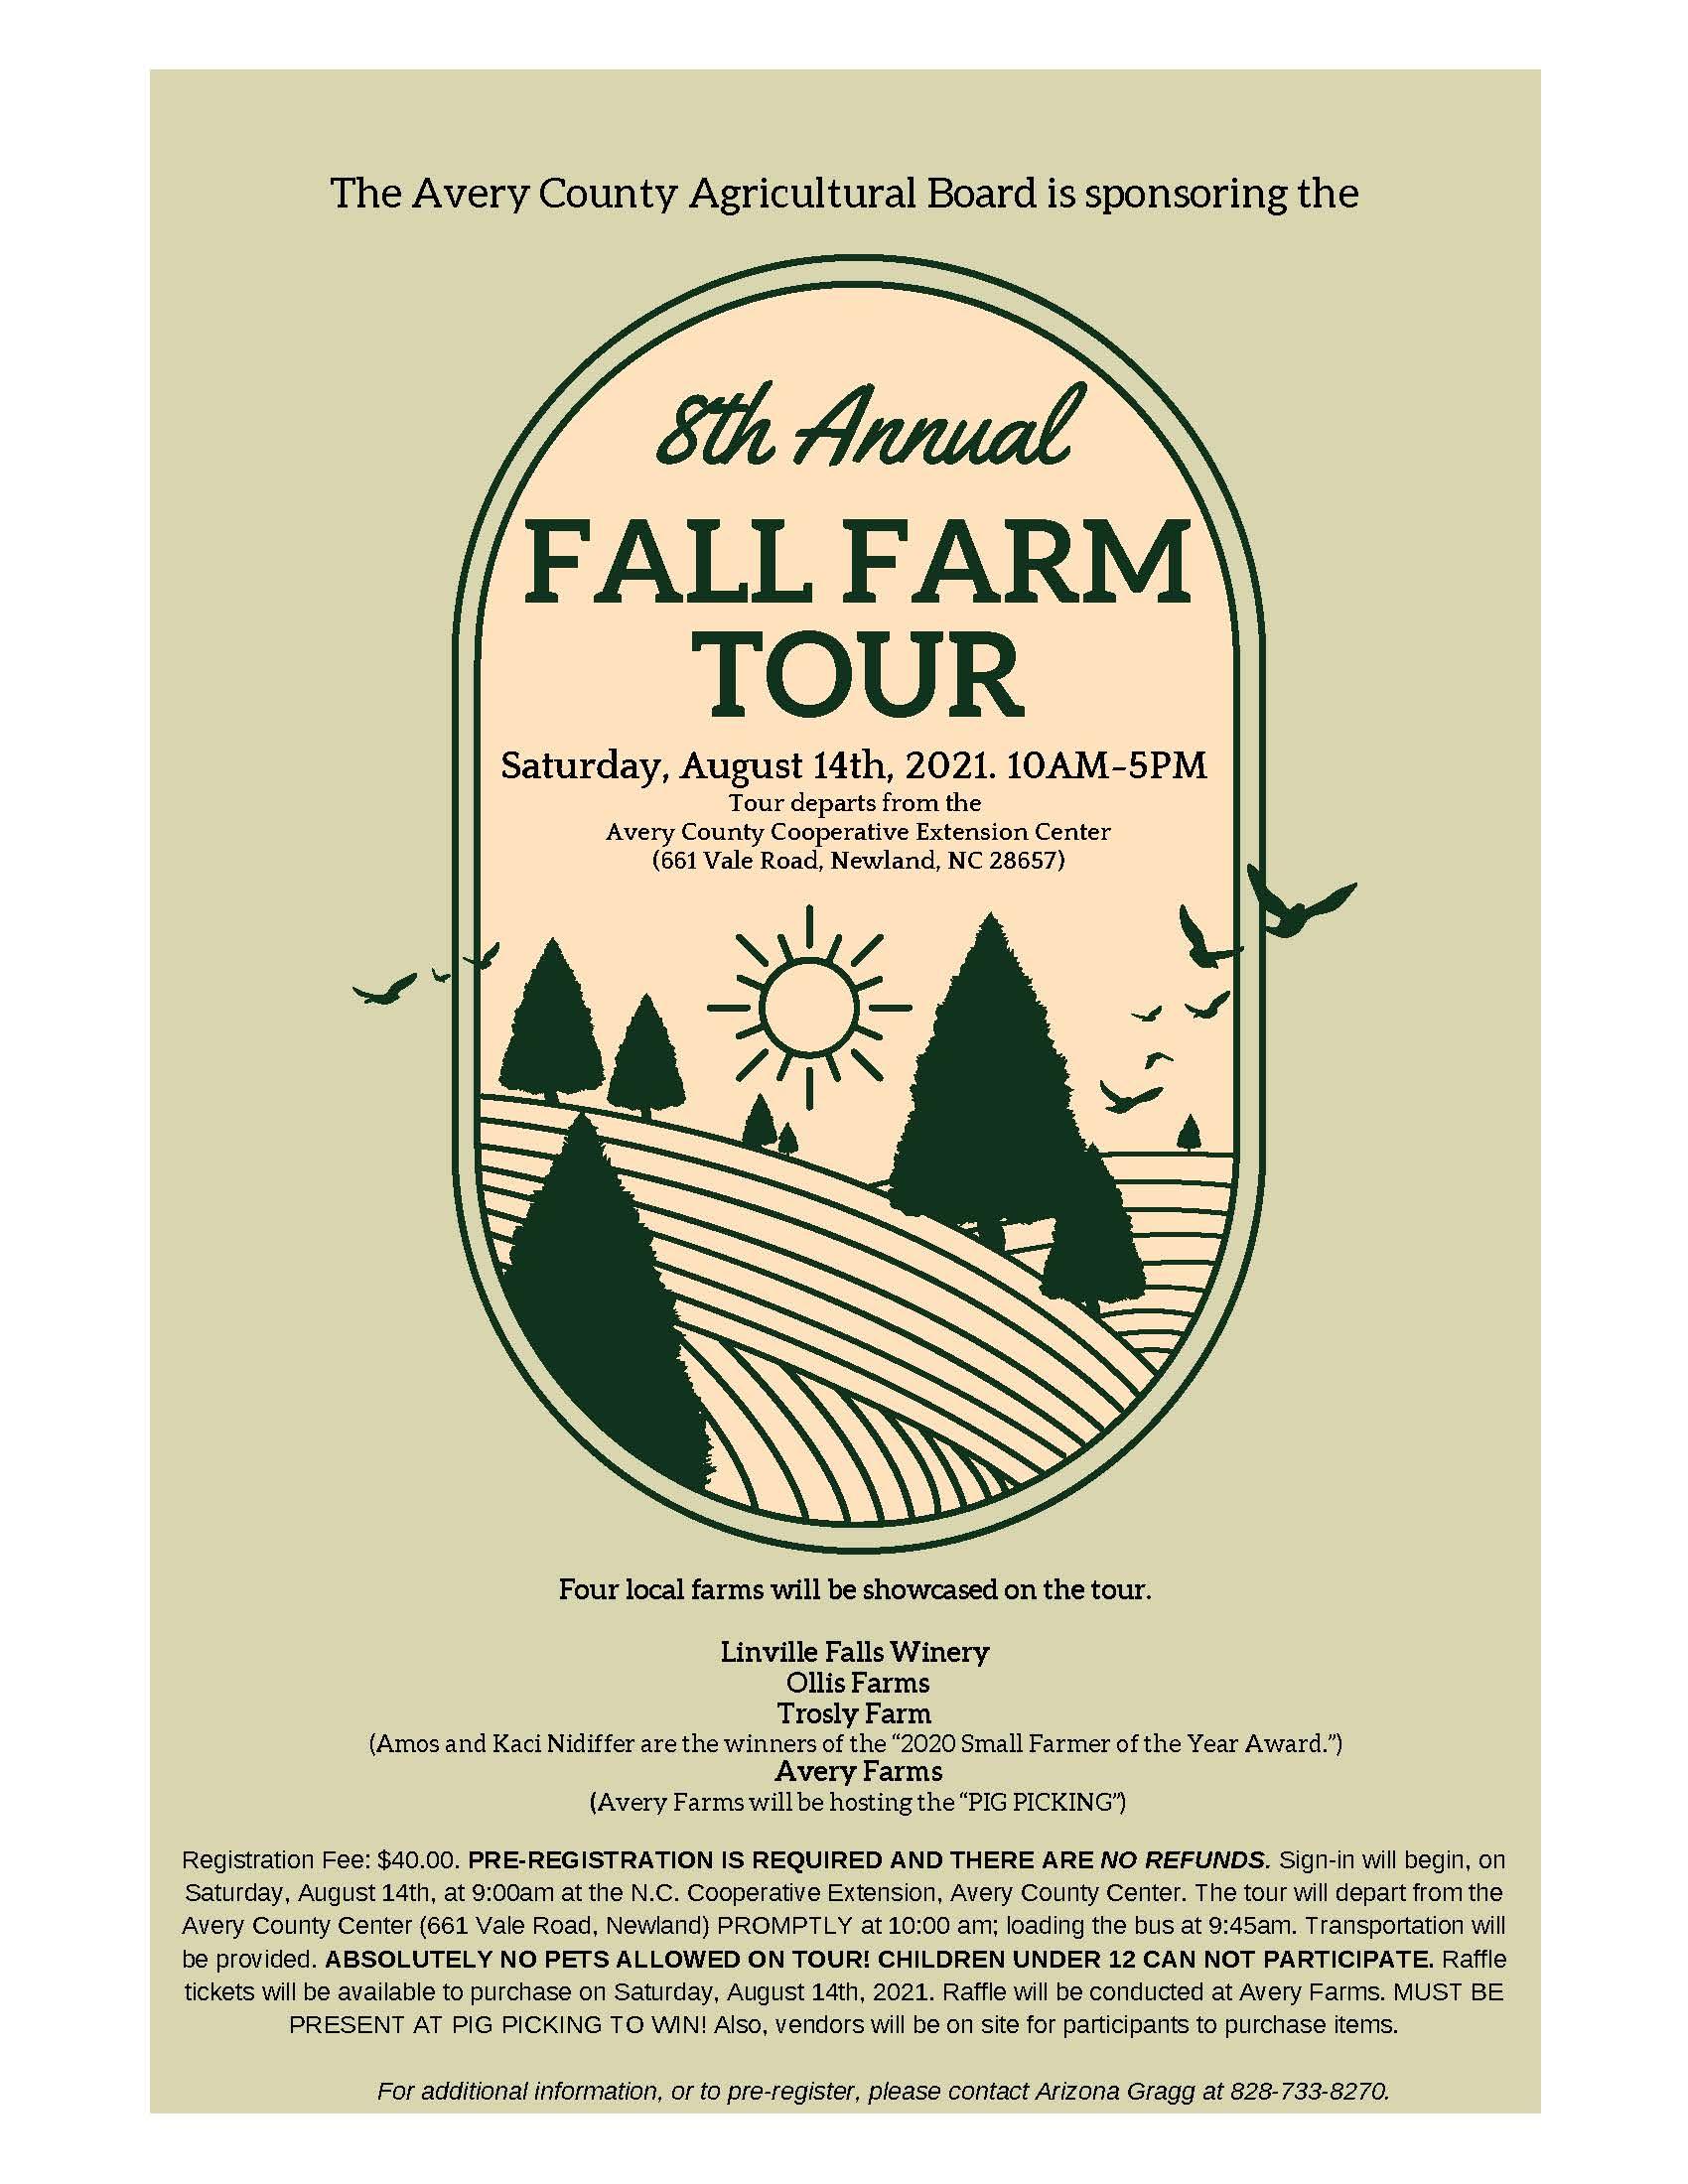 Fall Farm Tour flyer